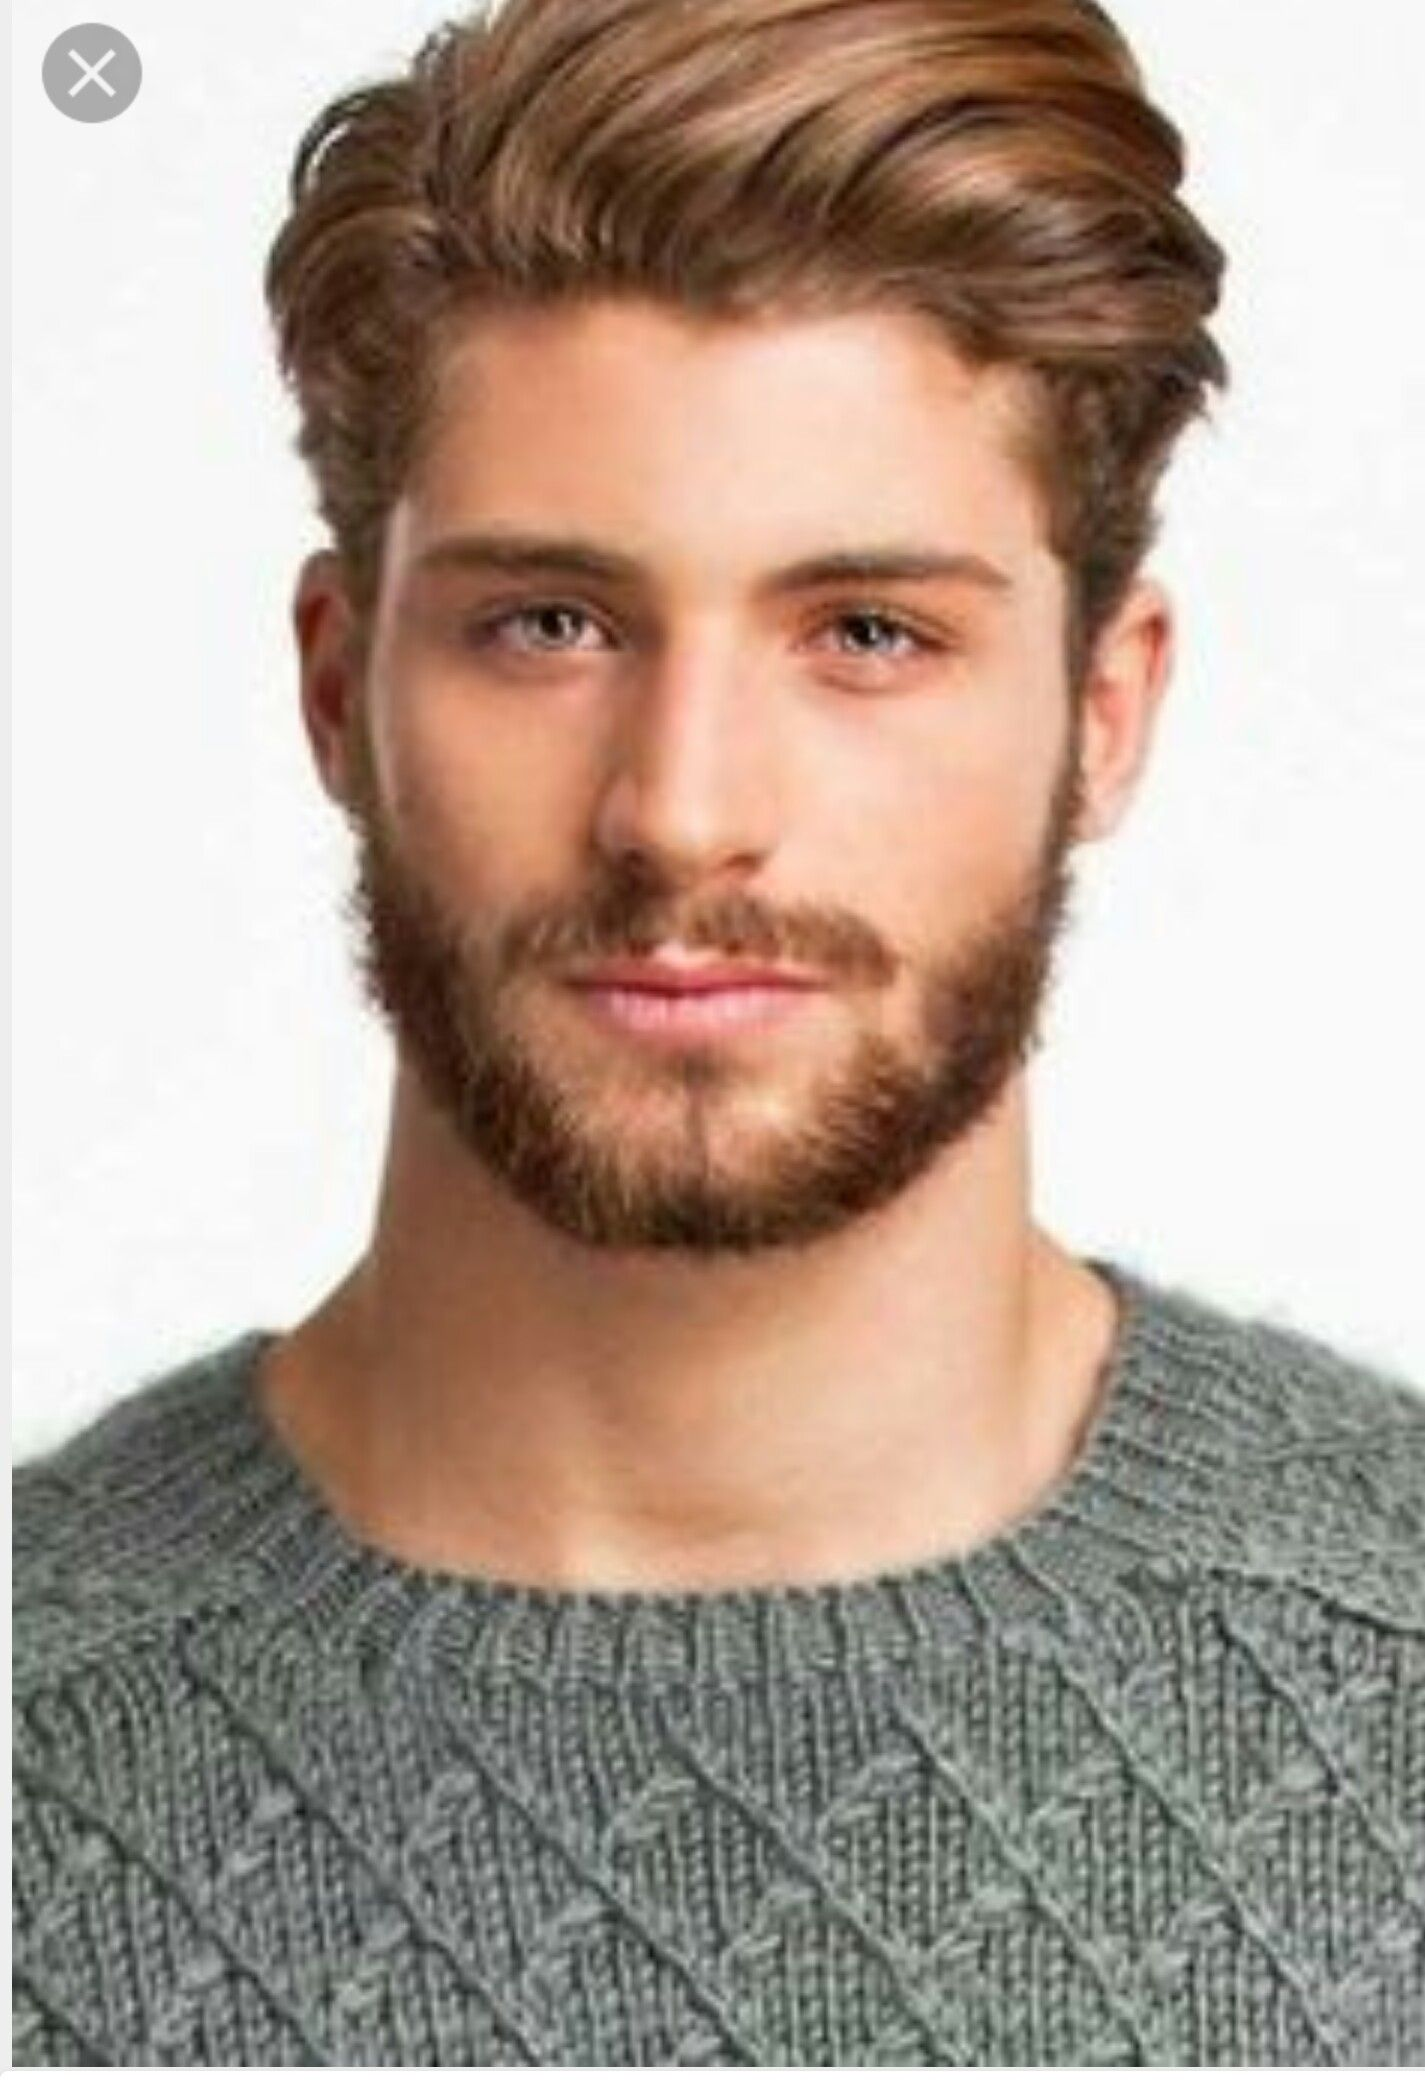 Medium Hair Mens Hairstyles Medium Medium Length Hair Men Haircuts For Men